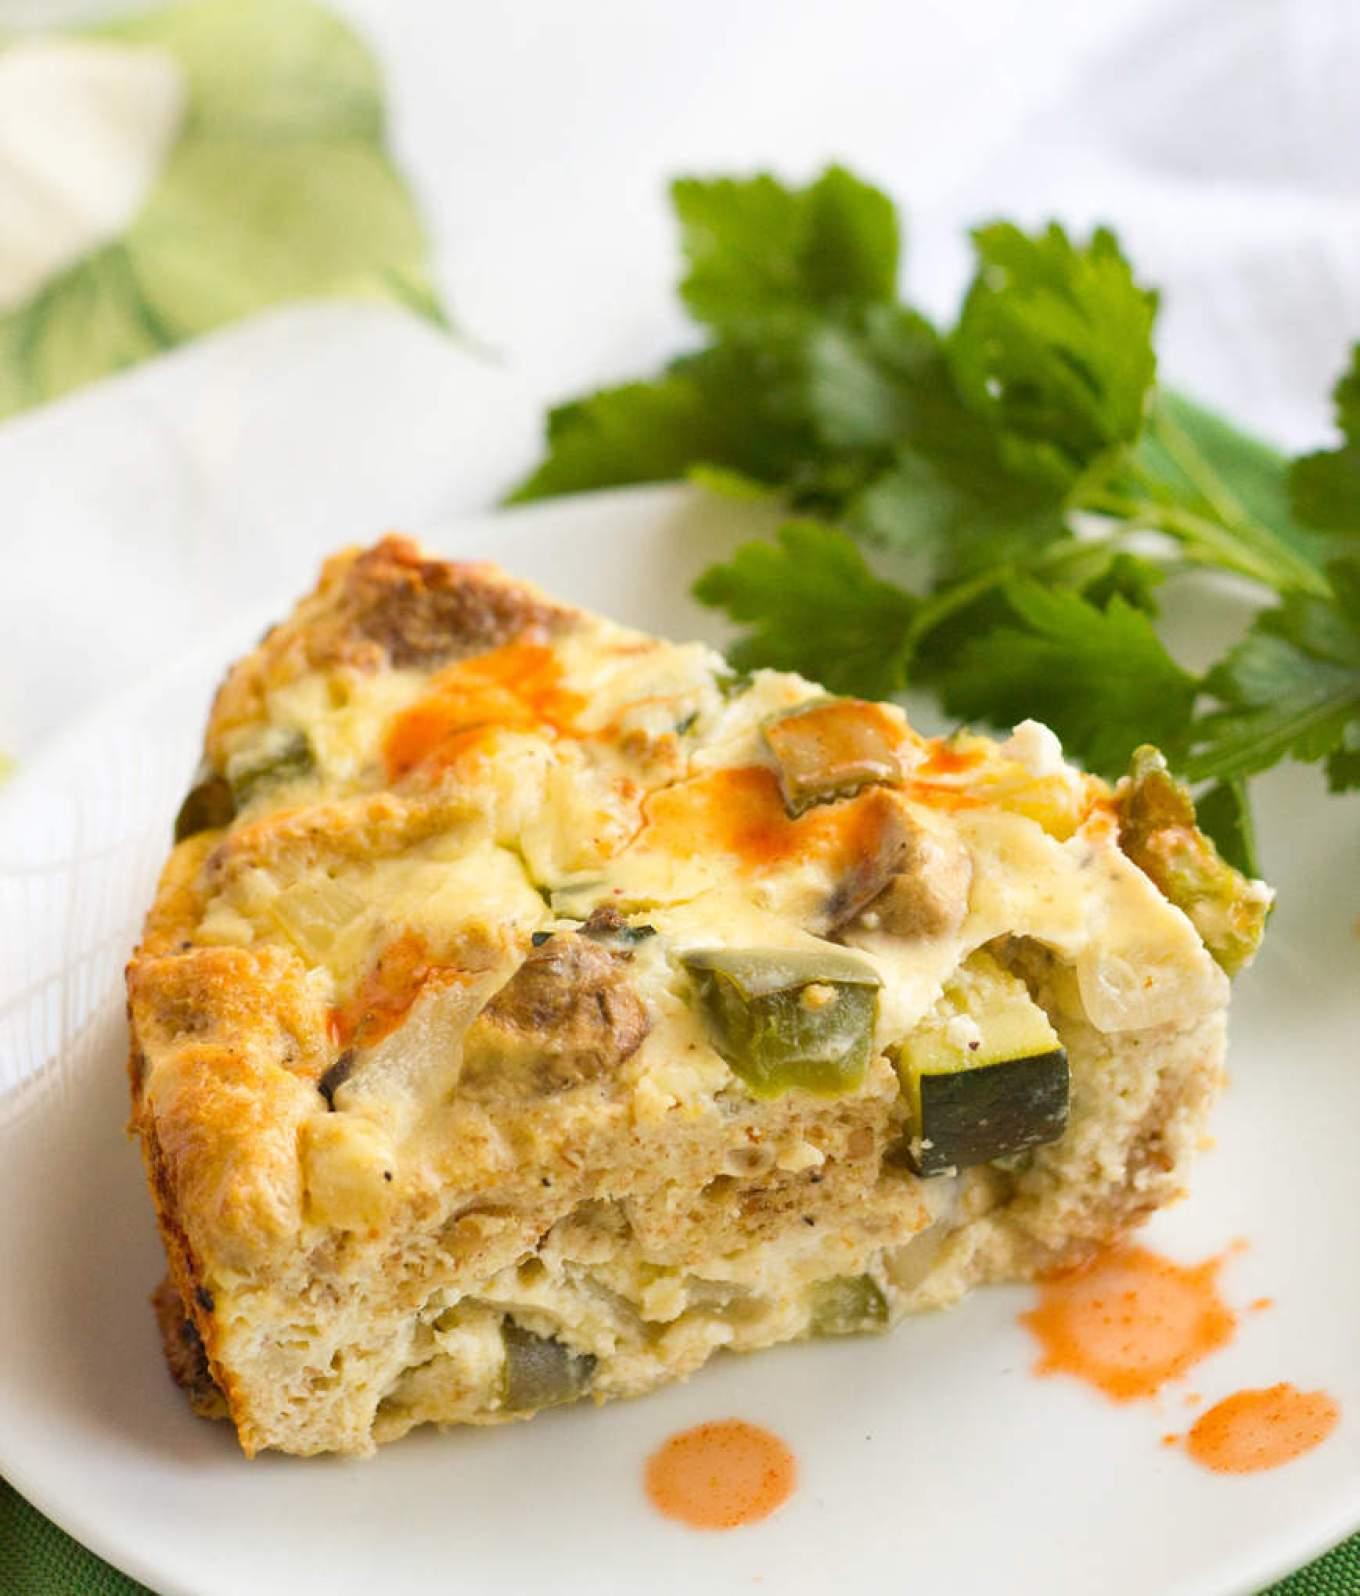 A super easy oven-baked vegetable frittata that's perfect for breakfast, brunch or even a light dinner! | FamilyFoodontheTable.com